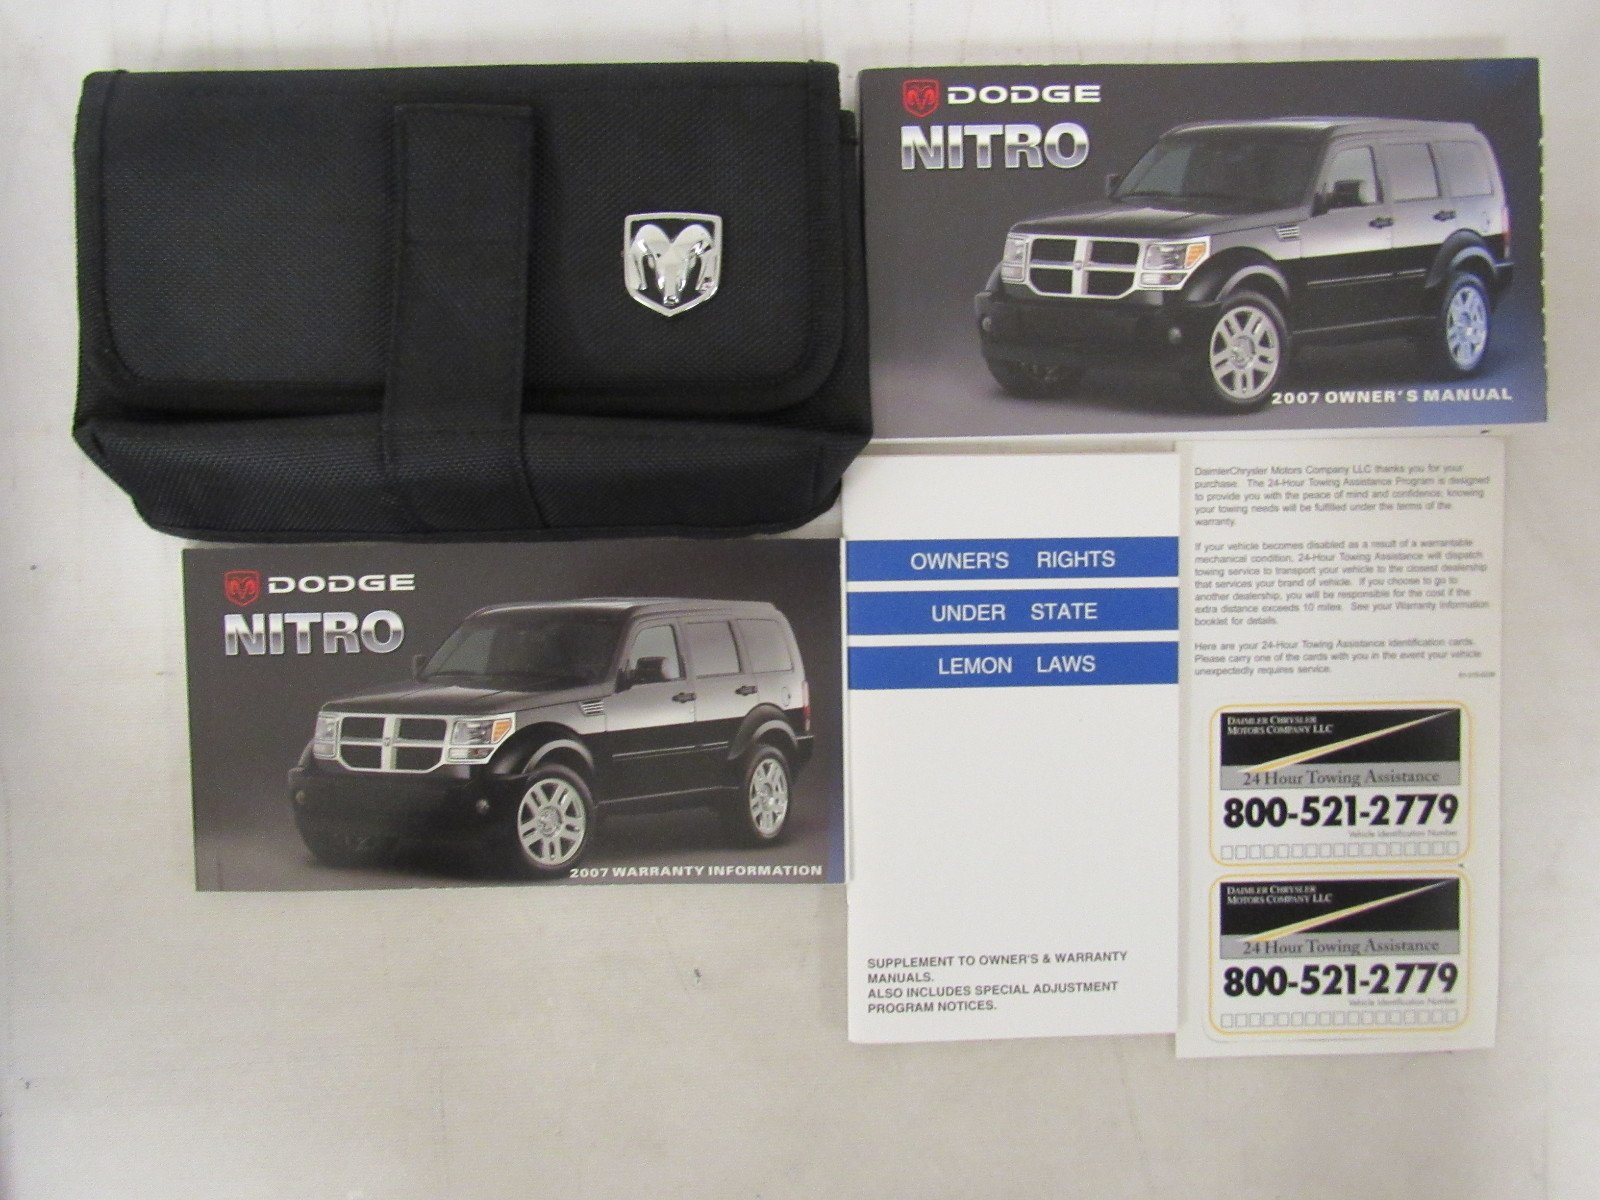 2007 dodge nitro owners manual book amazon com books rh amazon com 2007 Dodge Nitro Manual Transmission Dodge Nitro Manual Transmission